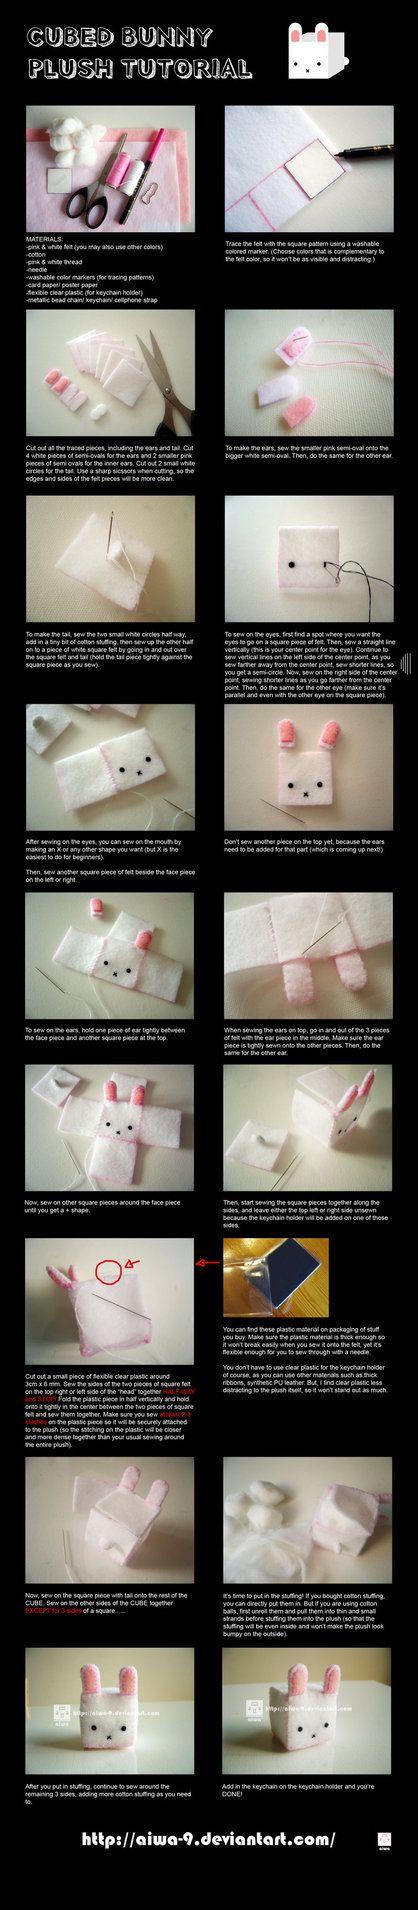 Cubimals! - CUBED bunny plush tutorial by ~aiwa-9 on deviantART